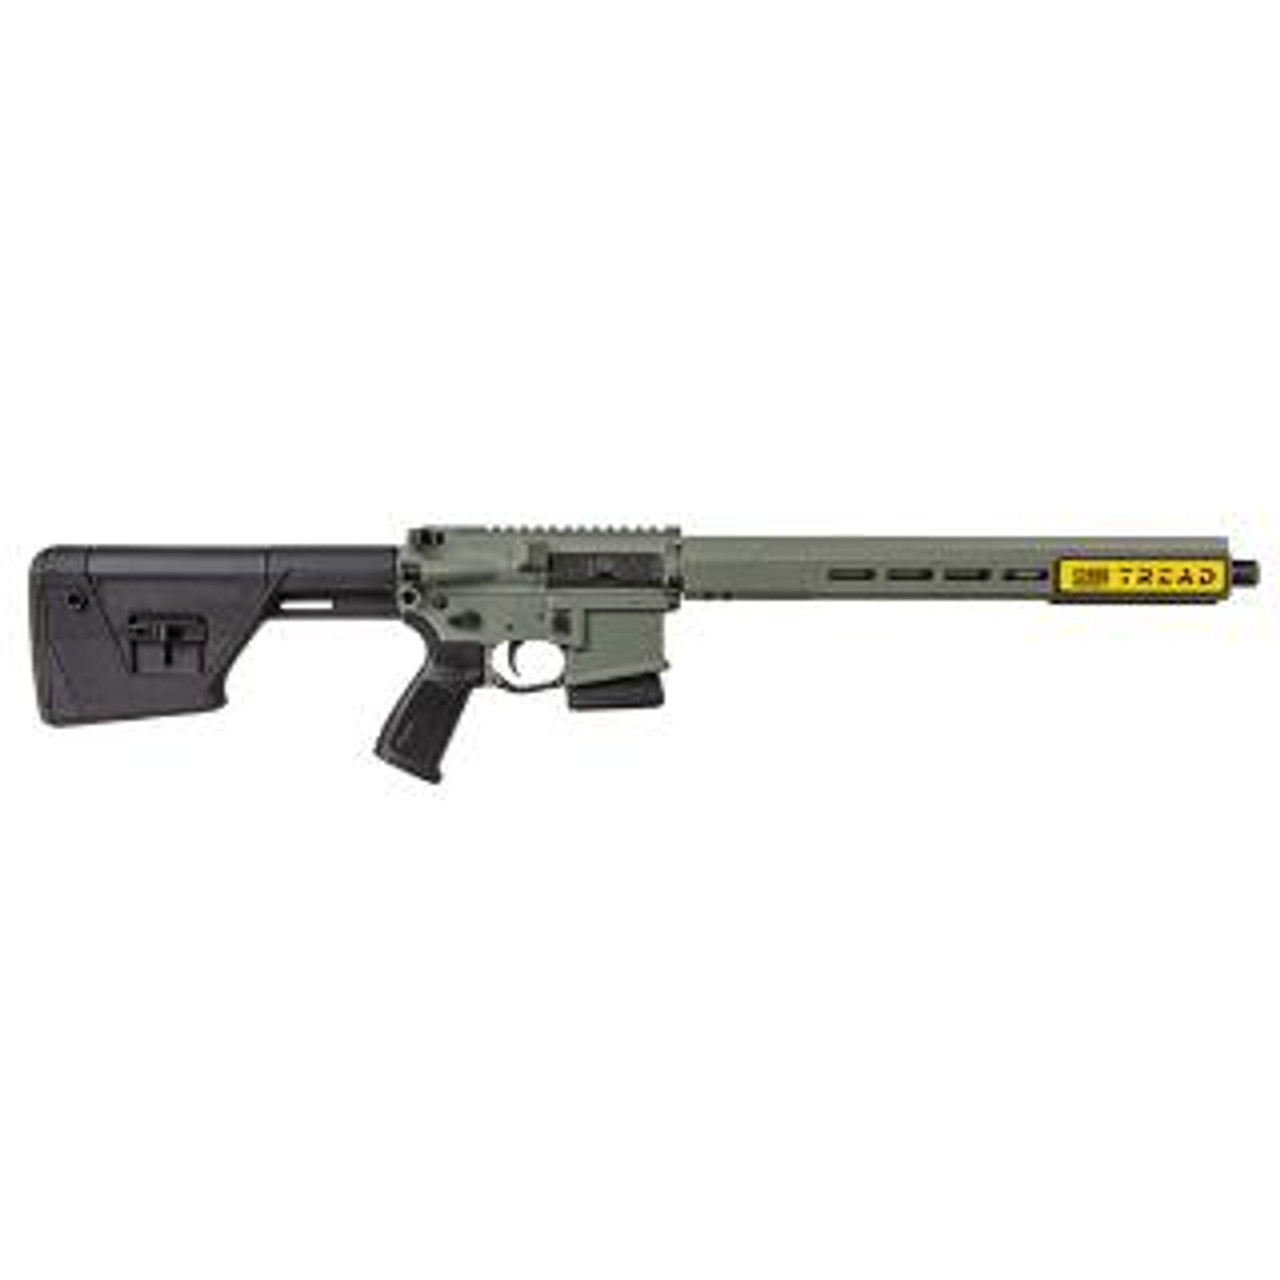 Sig Sauer M400 Tread Predator CALIFORNIA LEGAL - .233/5.56